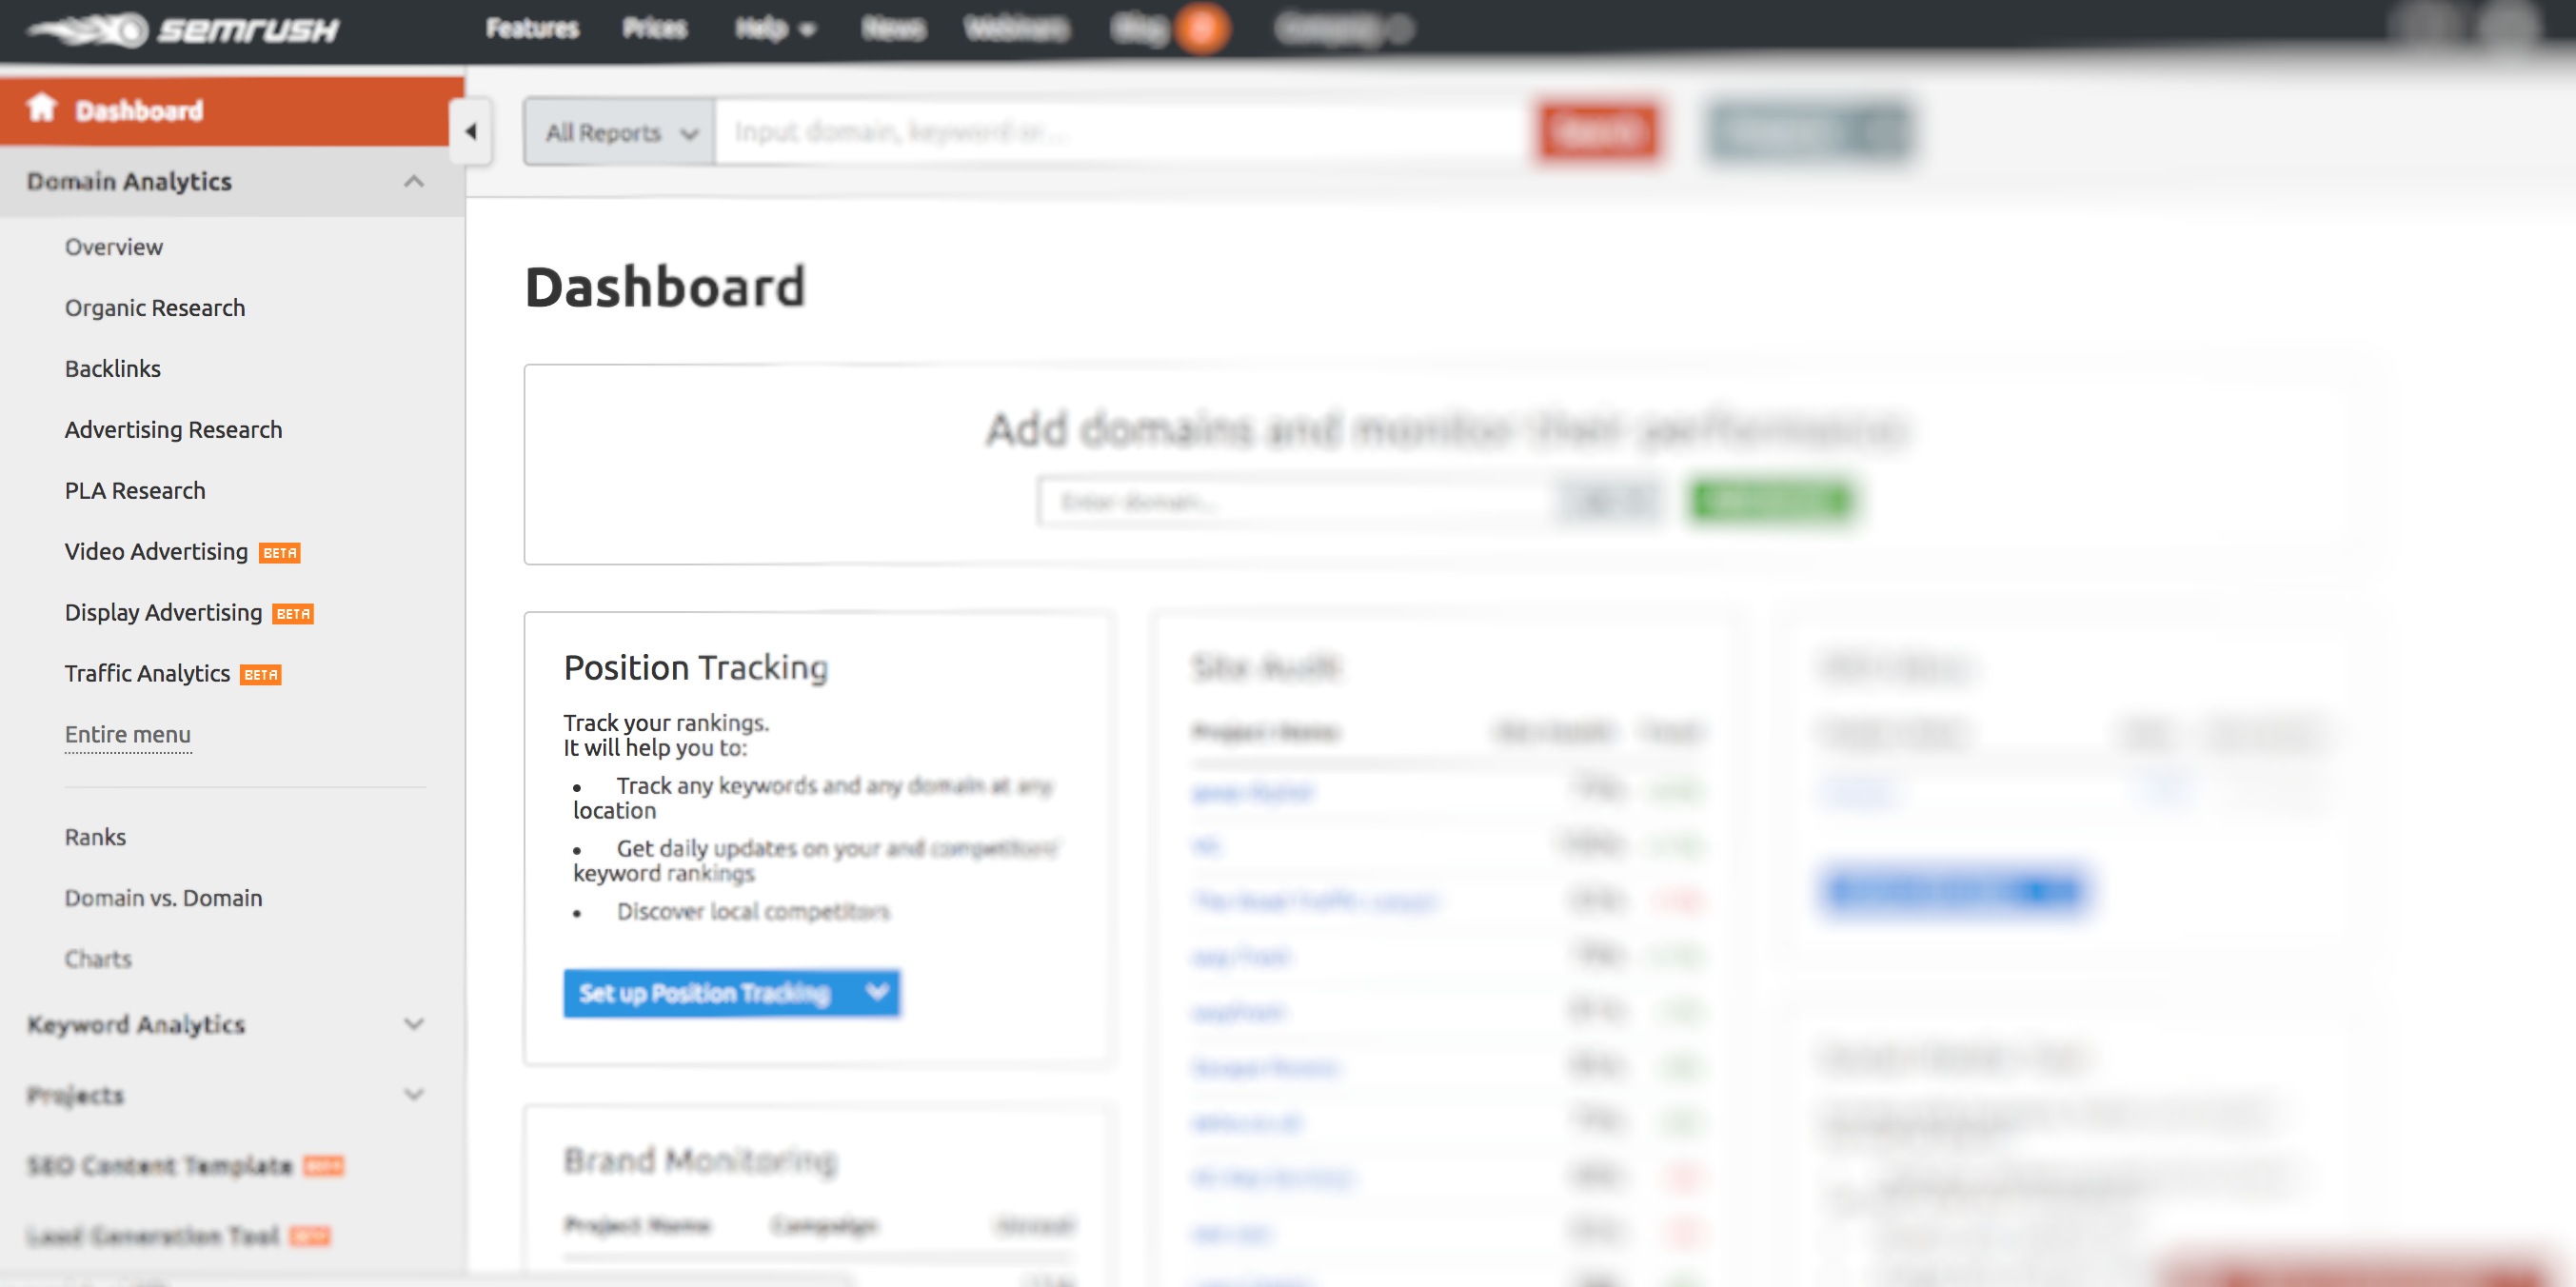 SEMrush dashboard example